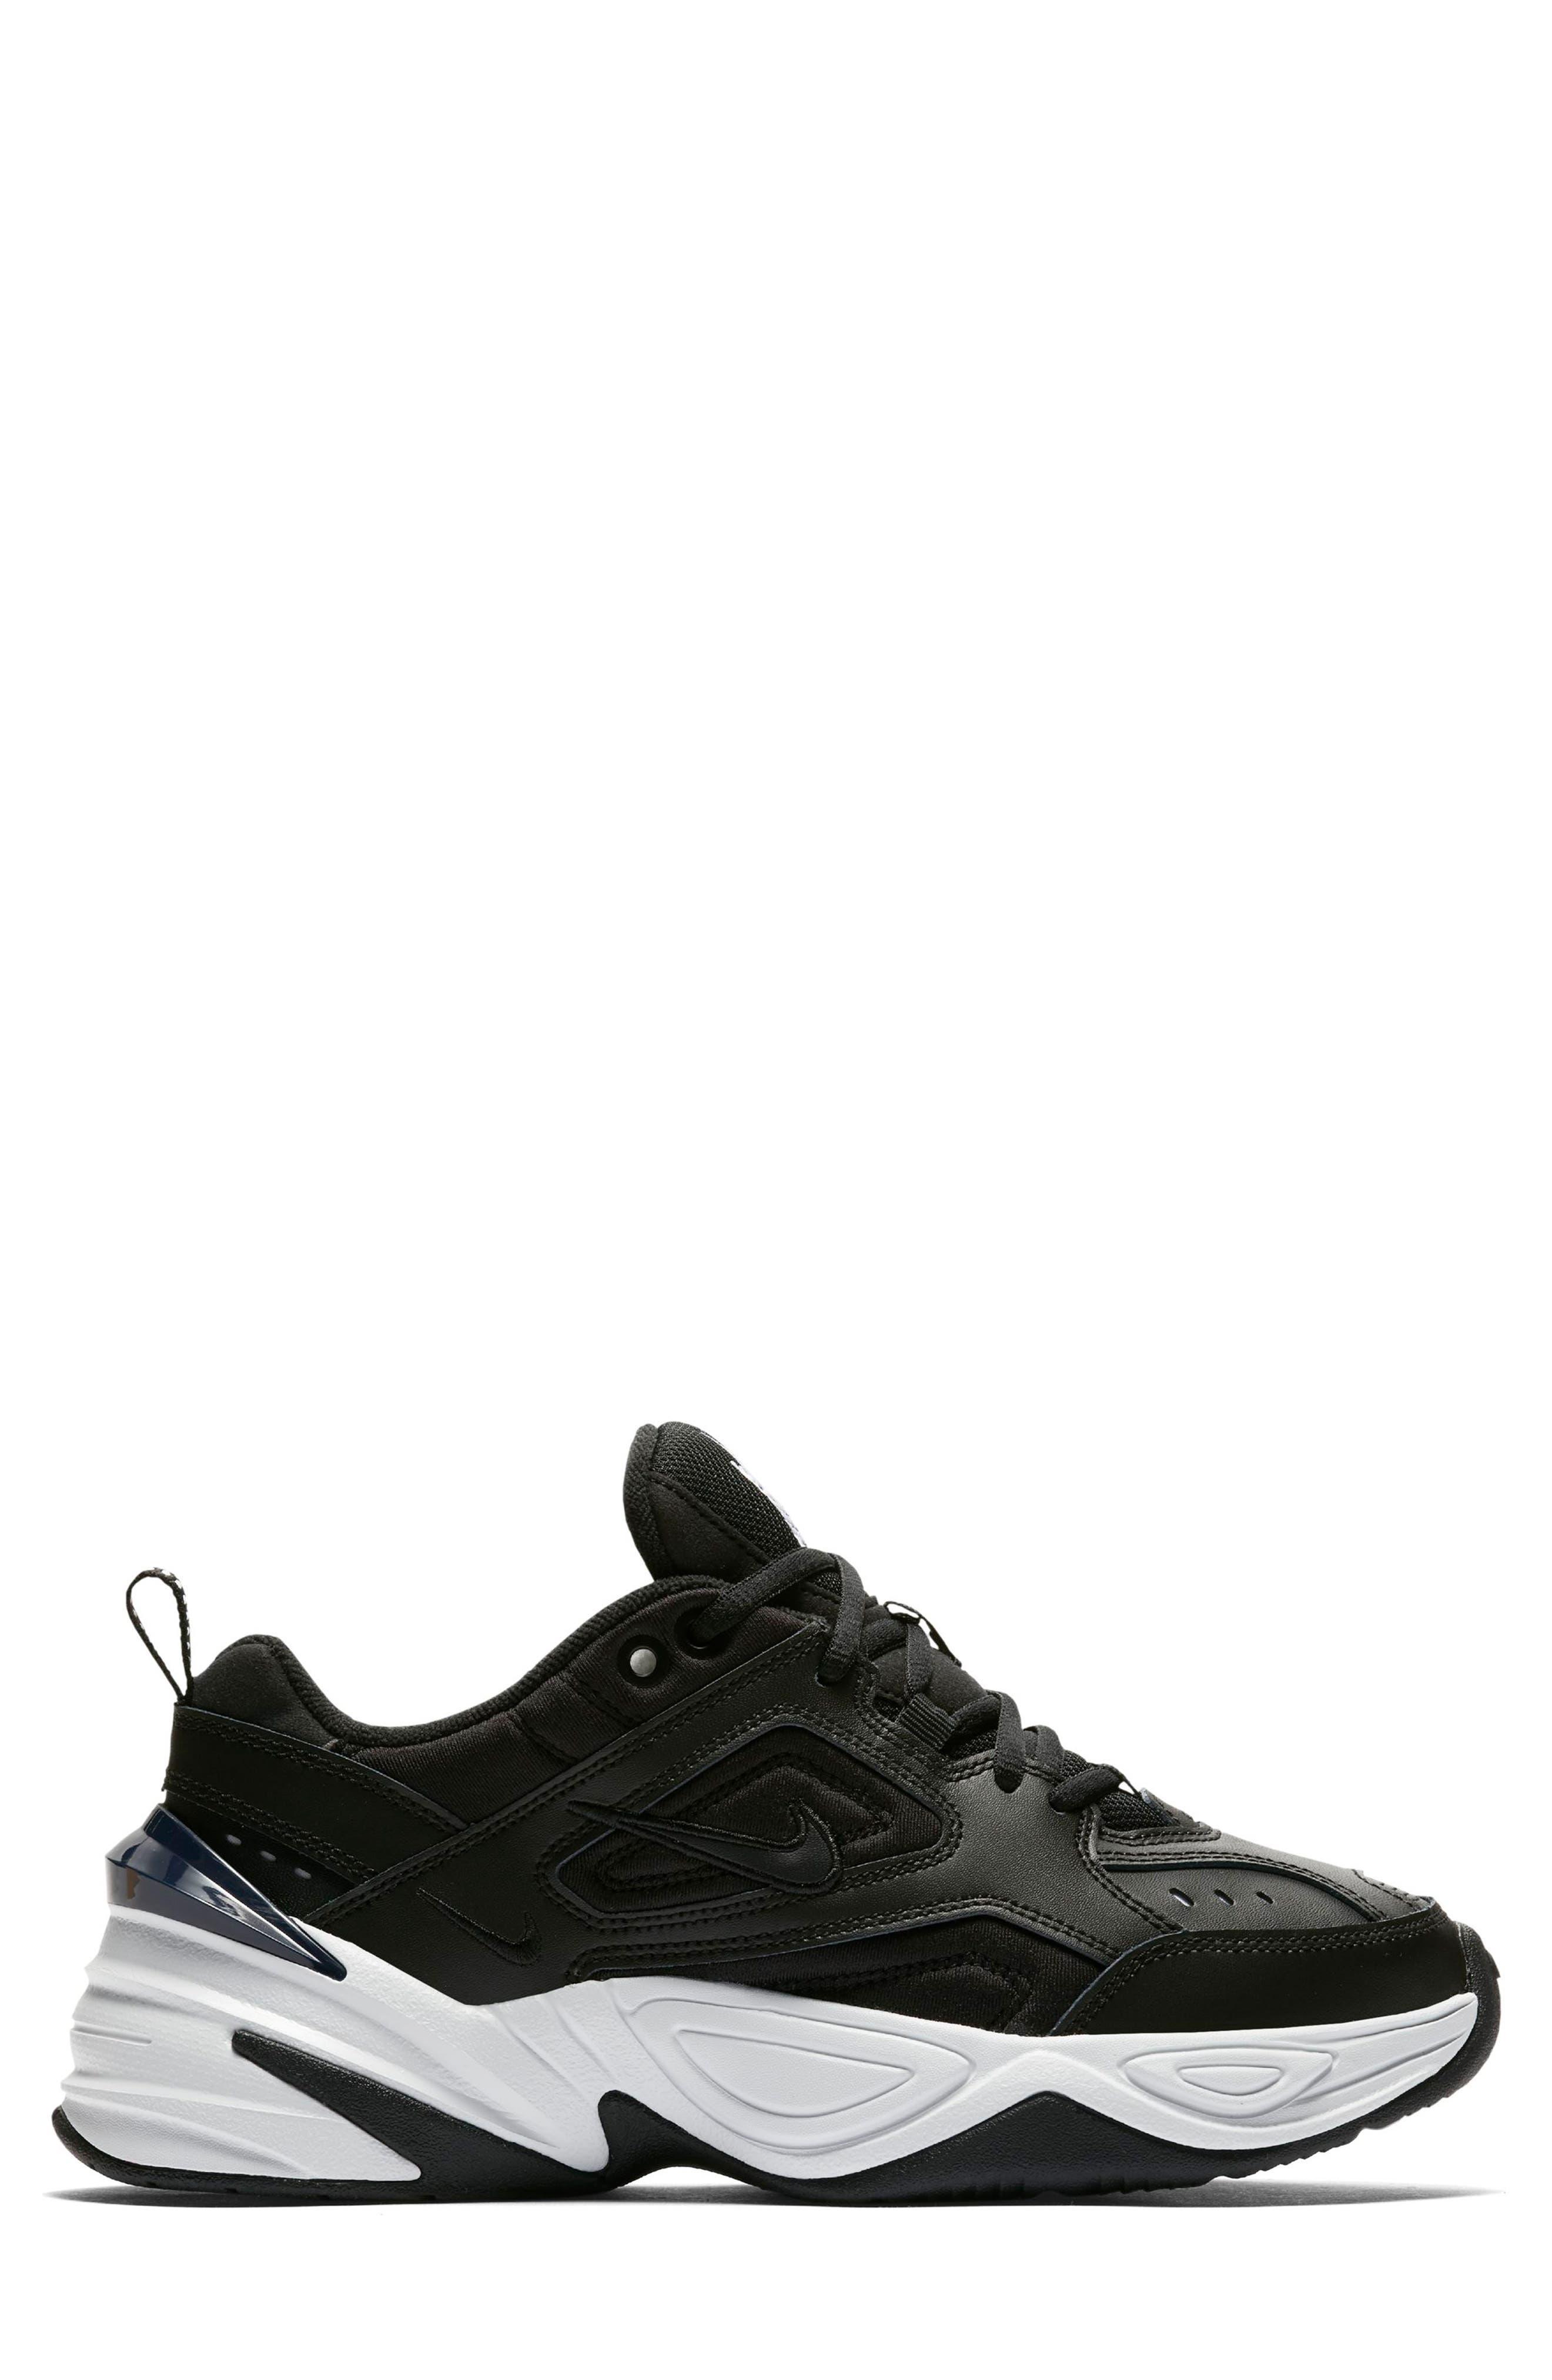 M2K Tekno Sneaker,                             Alternate thumbnail 3, color,                             BLACK/ OFF WHITE/ OBSIDIAN